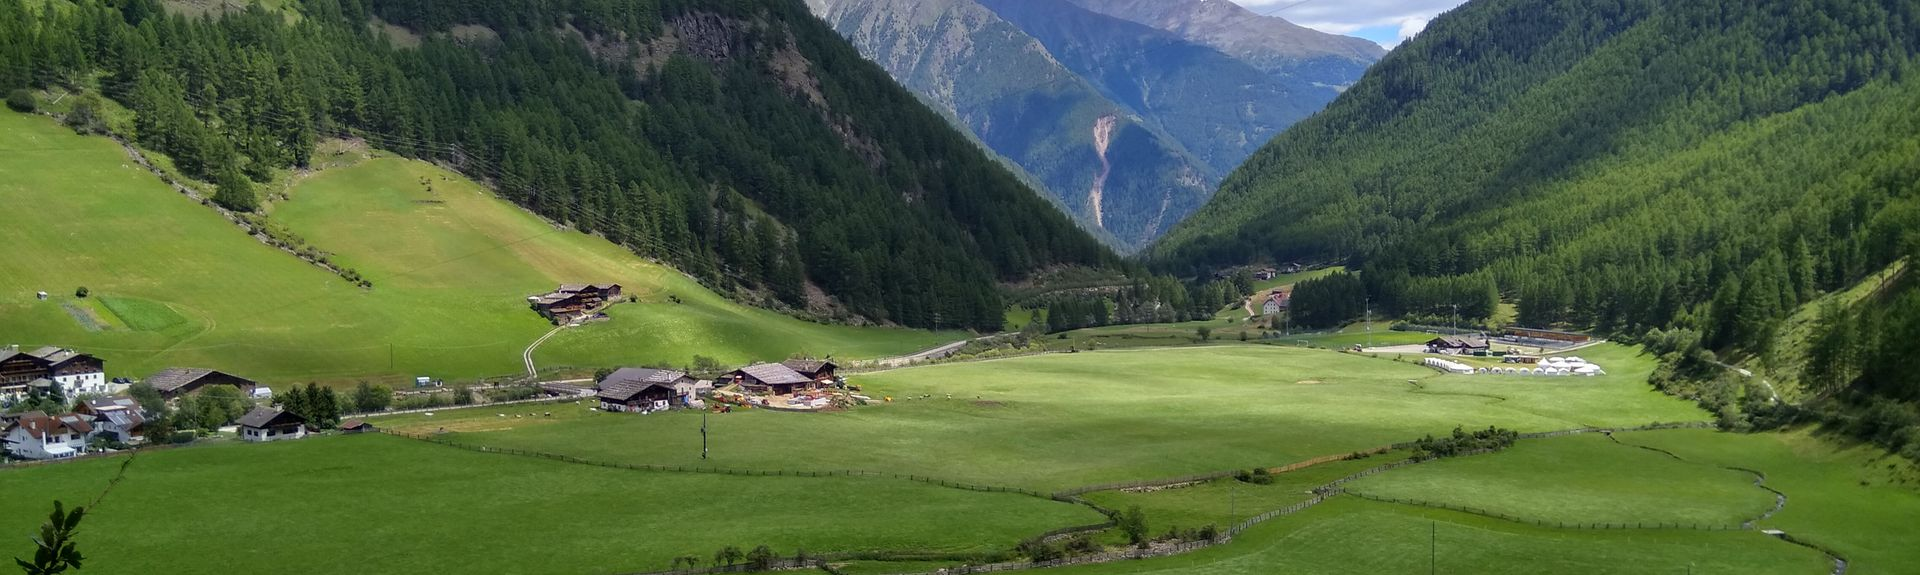 Partschins, Trentino-Alto Adige, Italy